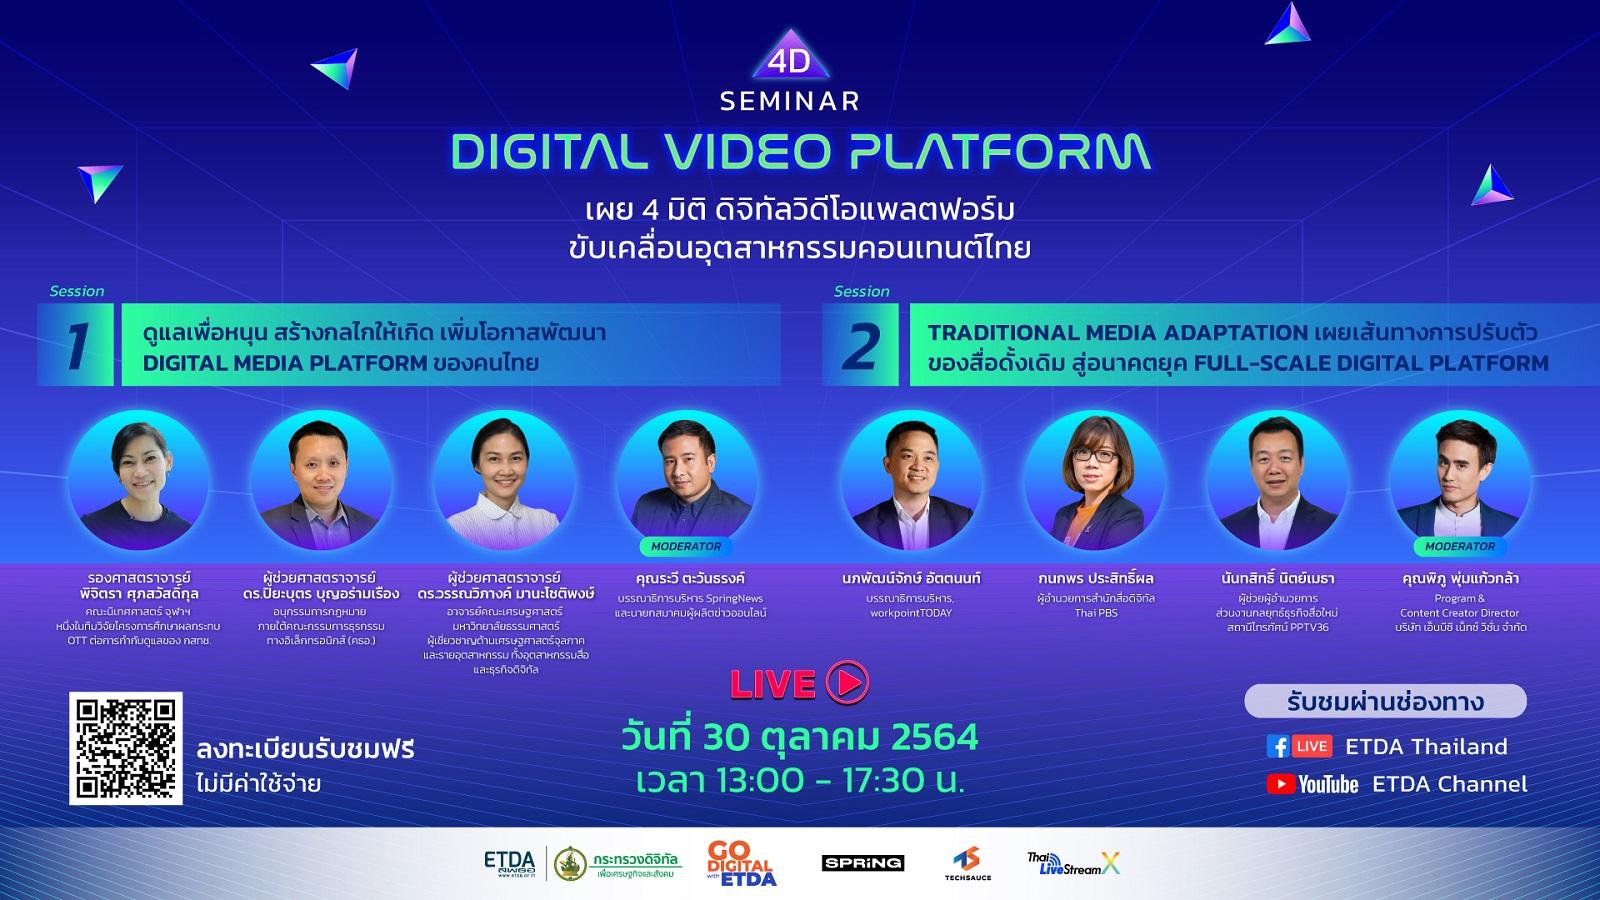 ETDA เตรียมจัด Digital Video Platform Seminar 4D เผยความเปลี่ยนแปลงในดิจิทัลวิดีโอแพลตฟอร์ม ที่ขับเคลื่อนอุตสาหกรรมคอนเทนต์ไทย